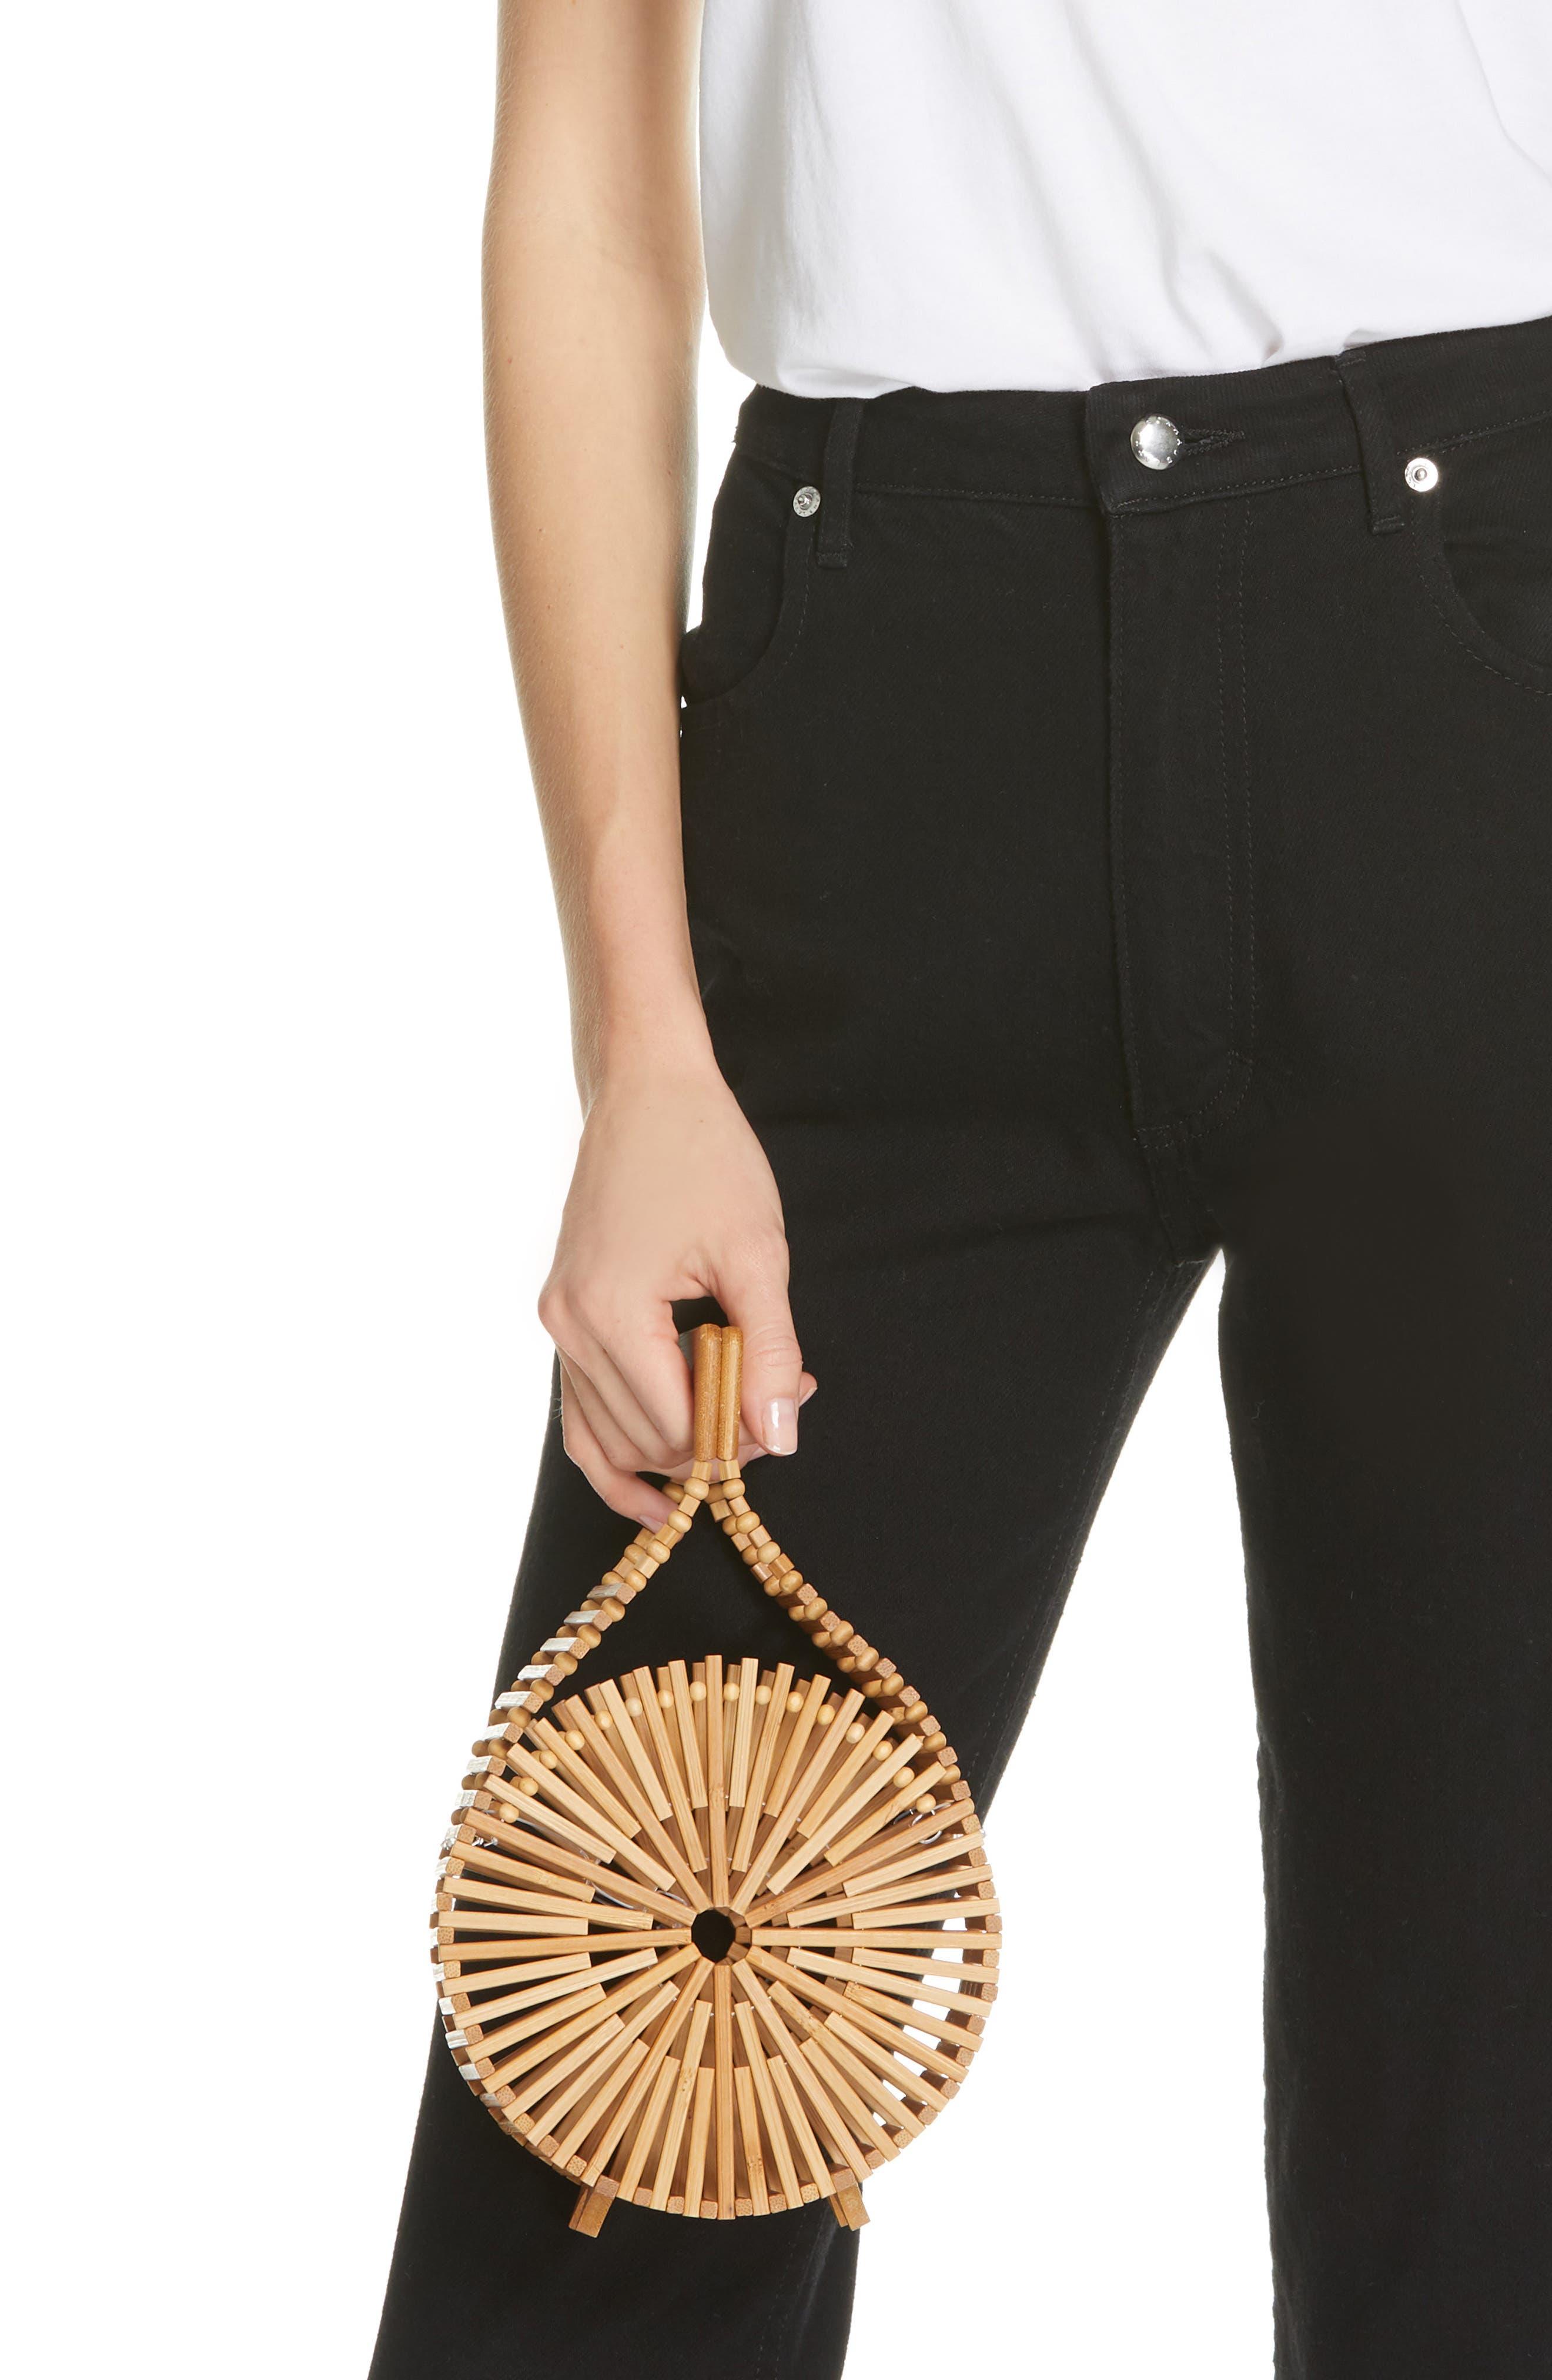 CULT GAIA, Zaha Top Handle Bamboo Bag, Alternate thumbnail 2, color, TAN NATURAL